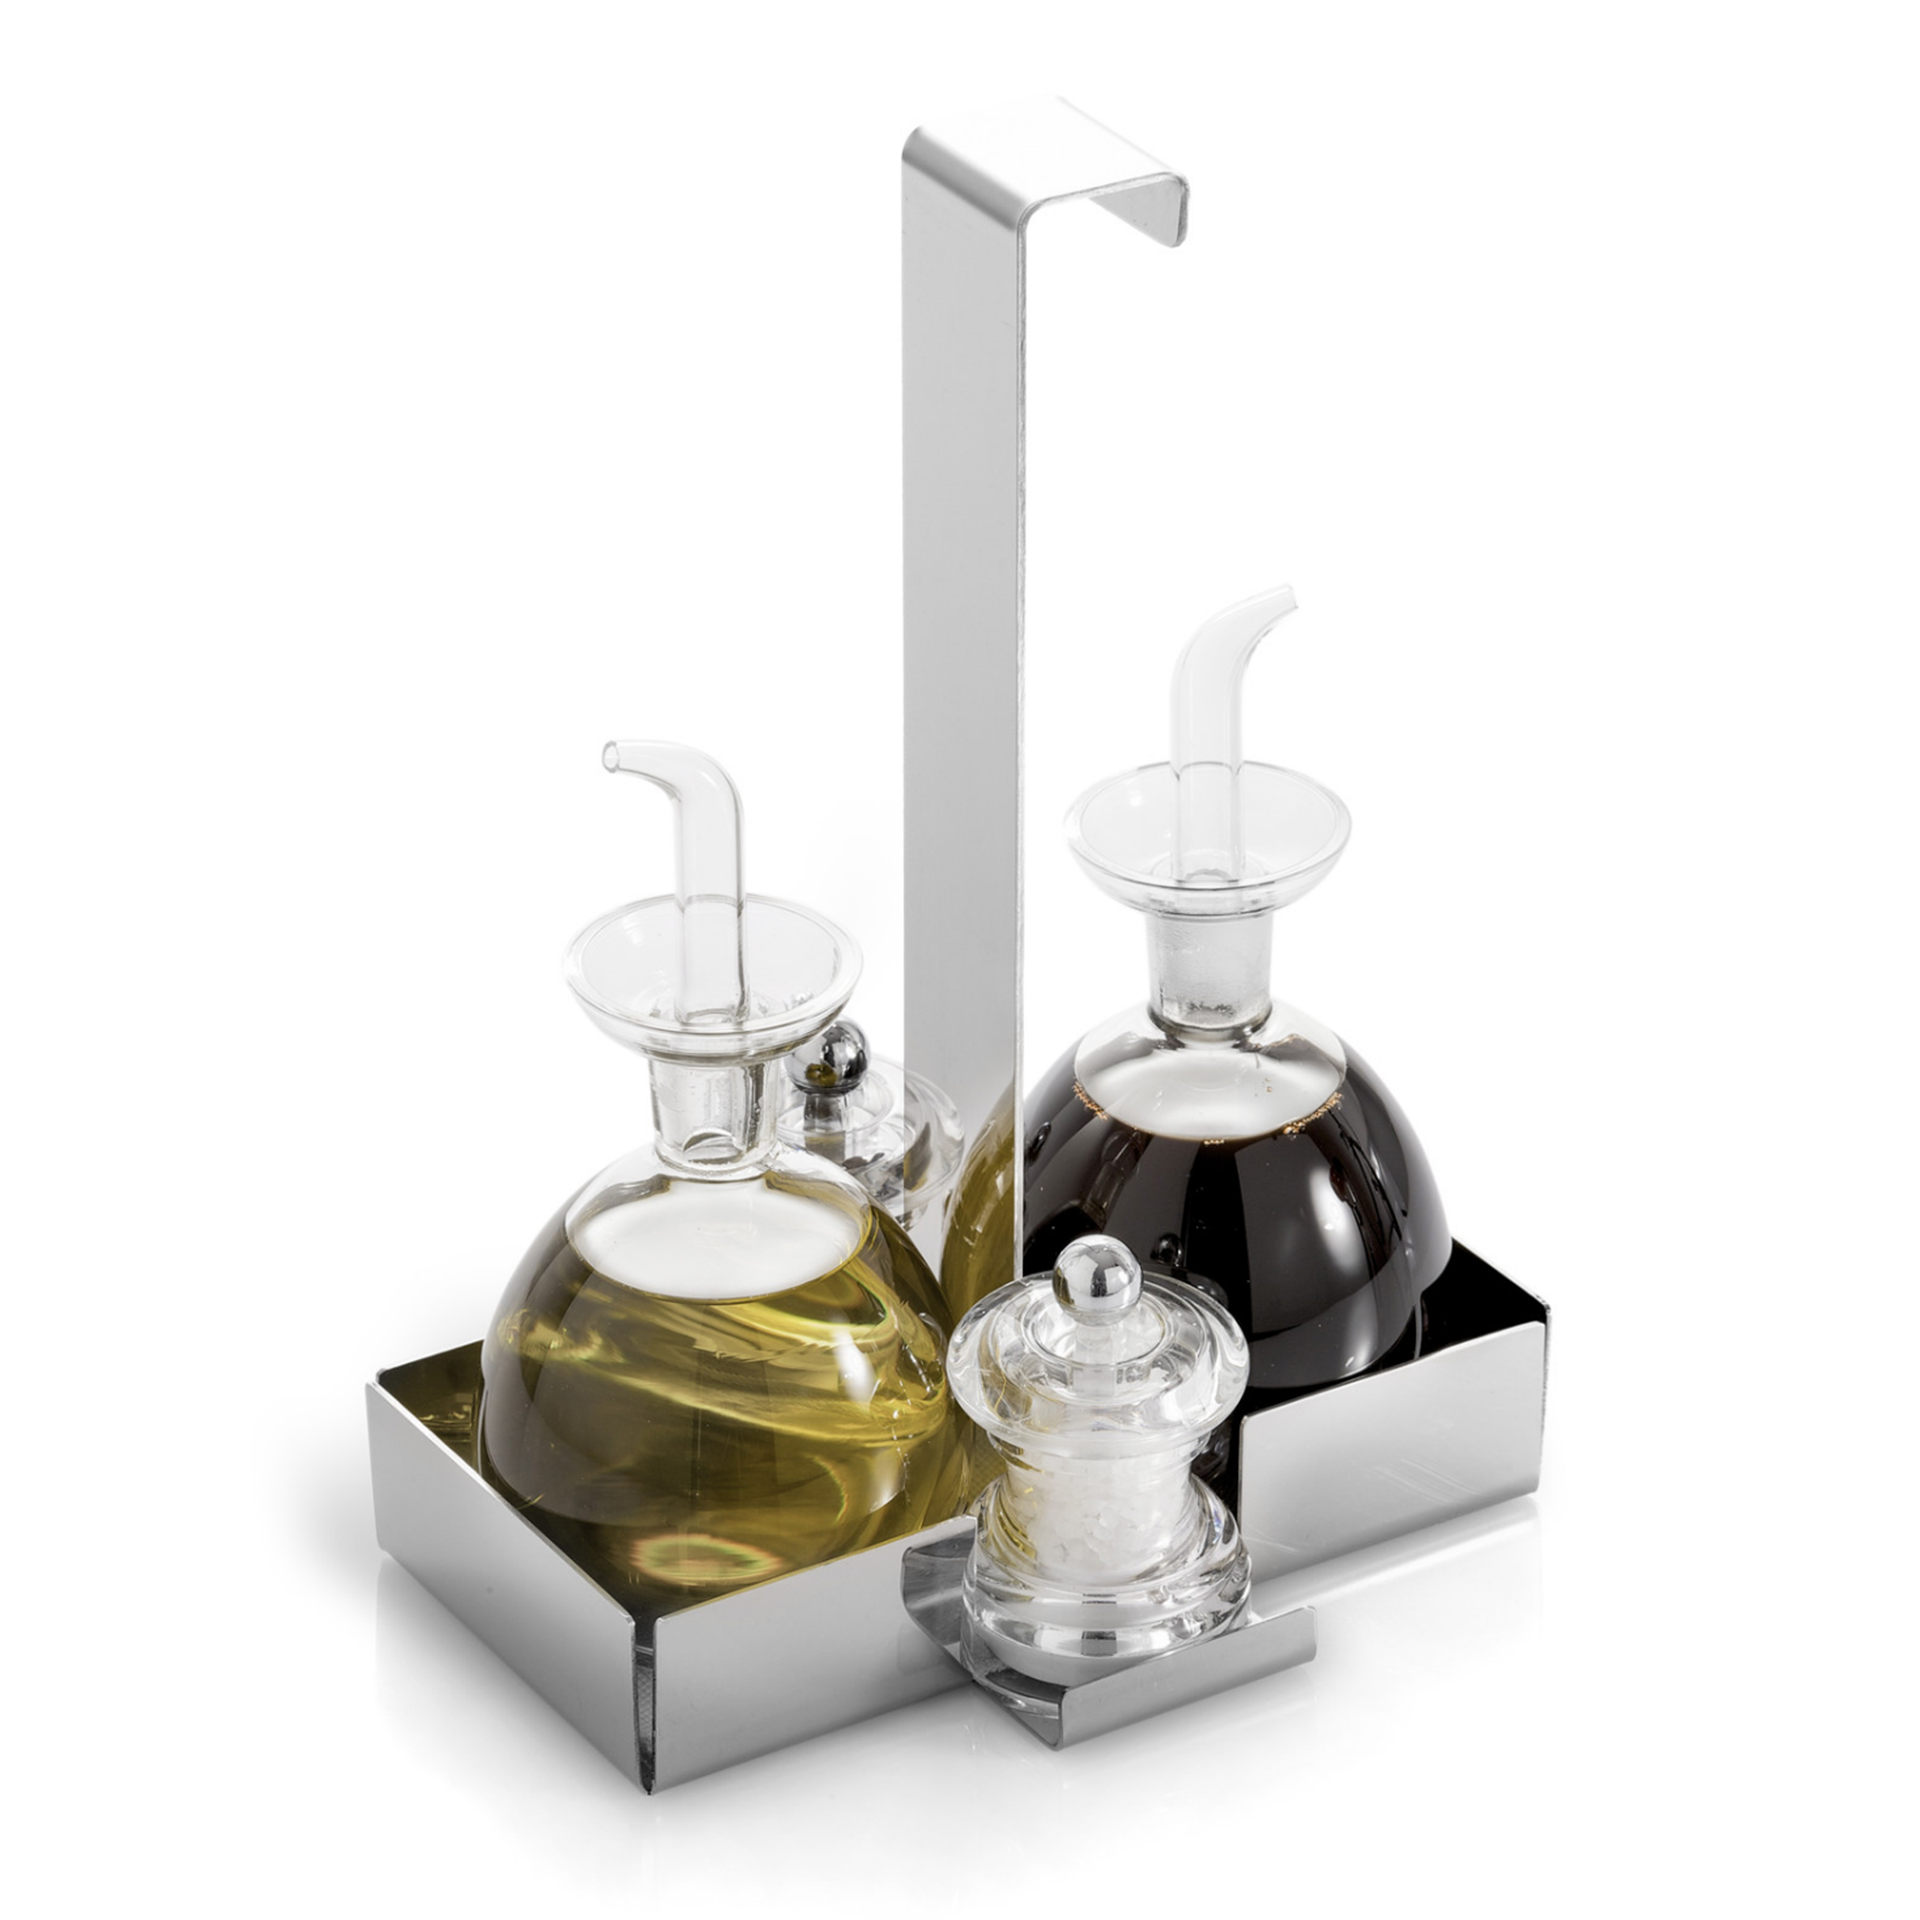 Vinegar On Stainless Steel